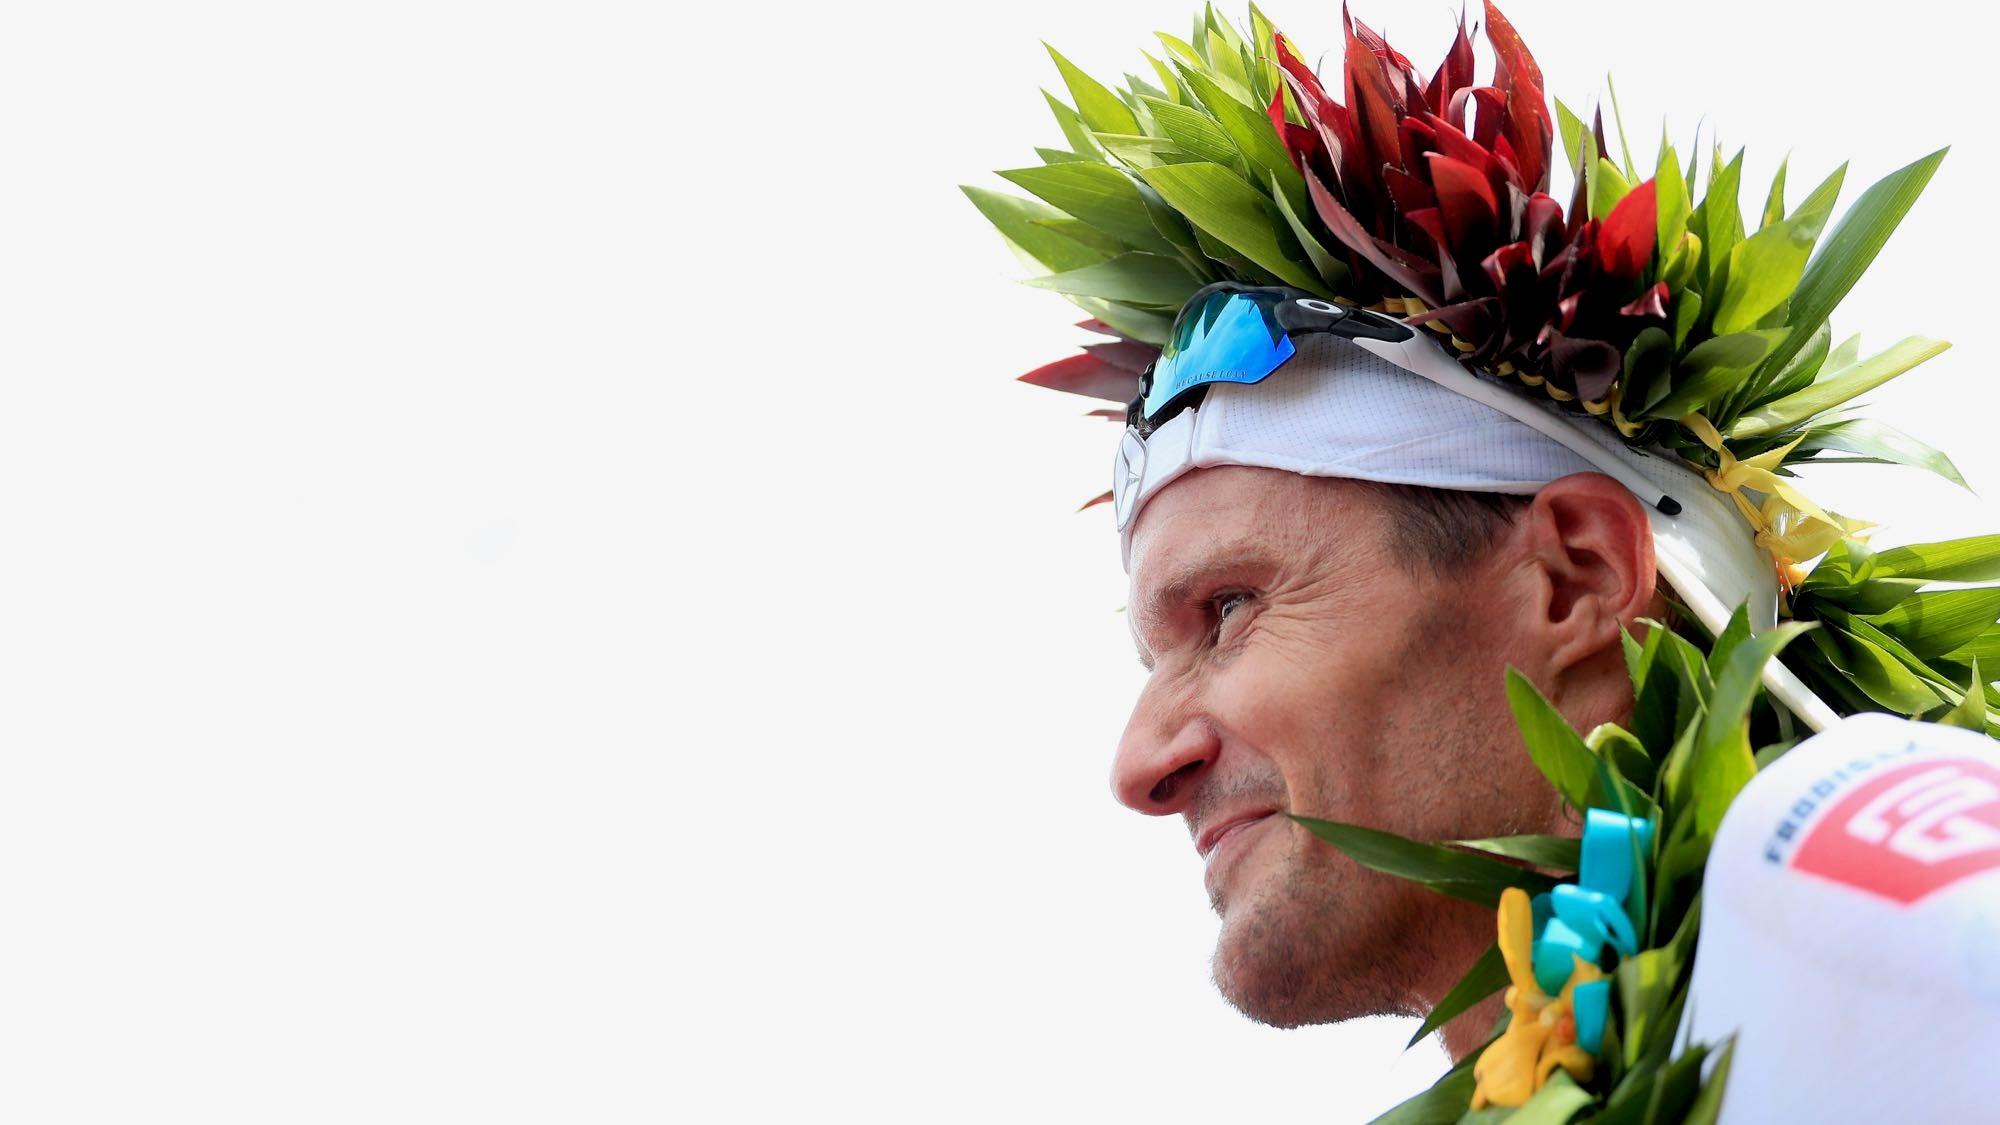 Triathlon News & Notes: Jan Stalled On Way to Miami, Cunnama Retires – Triathlete